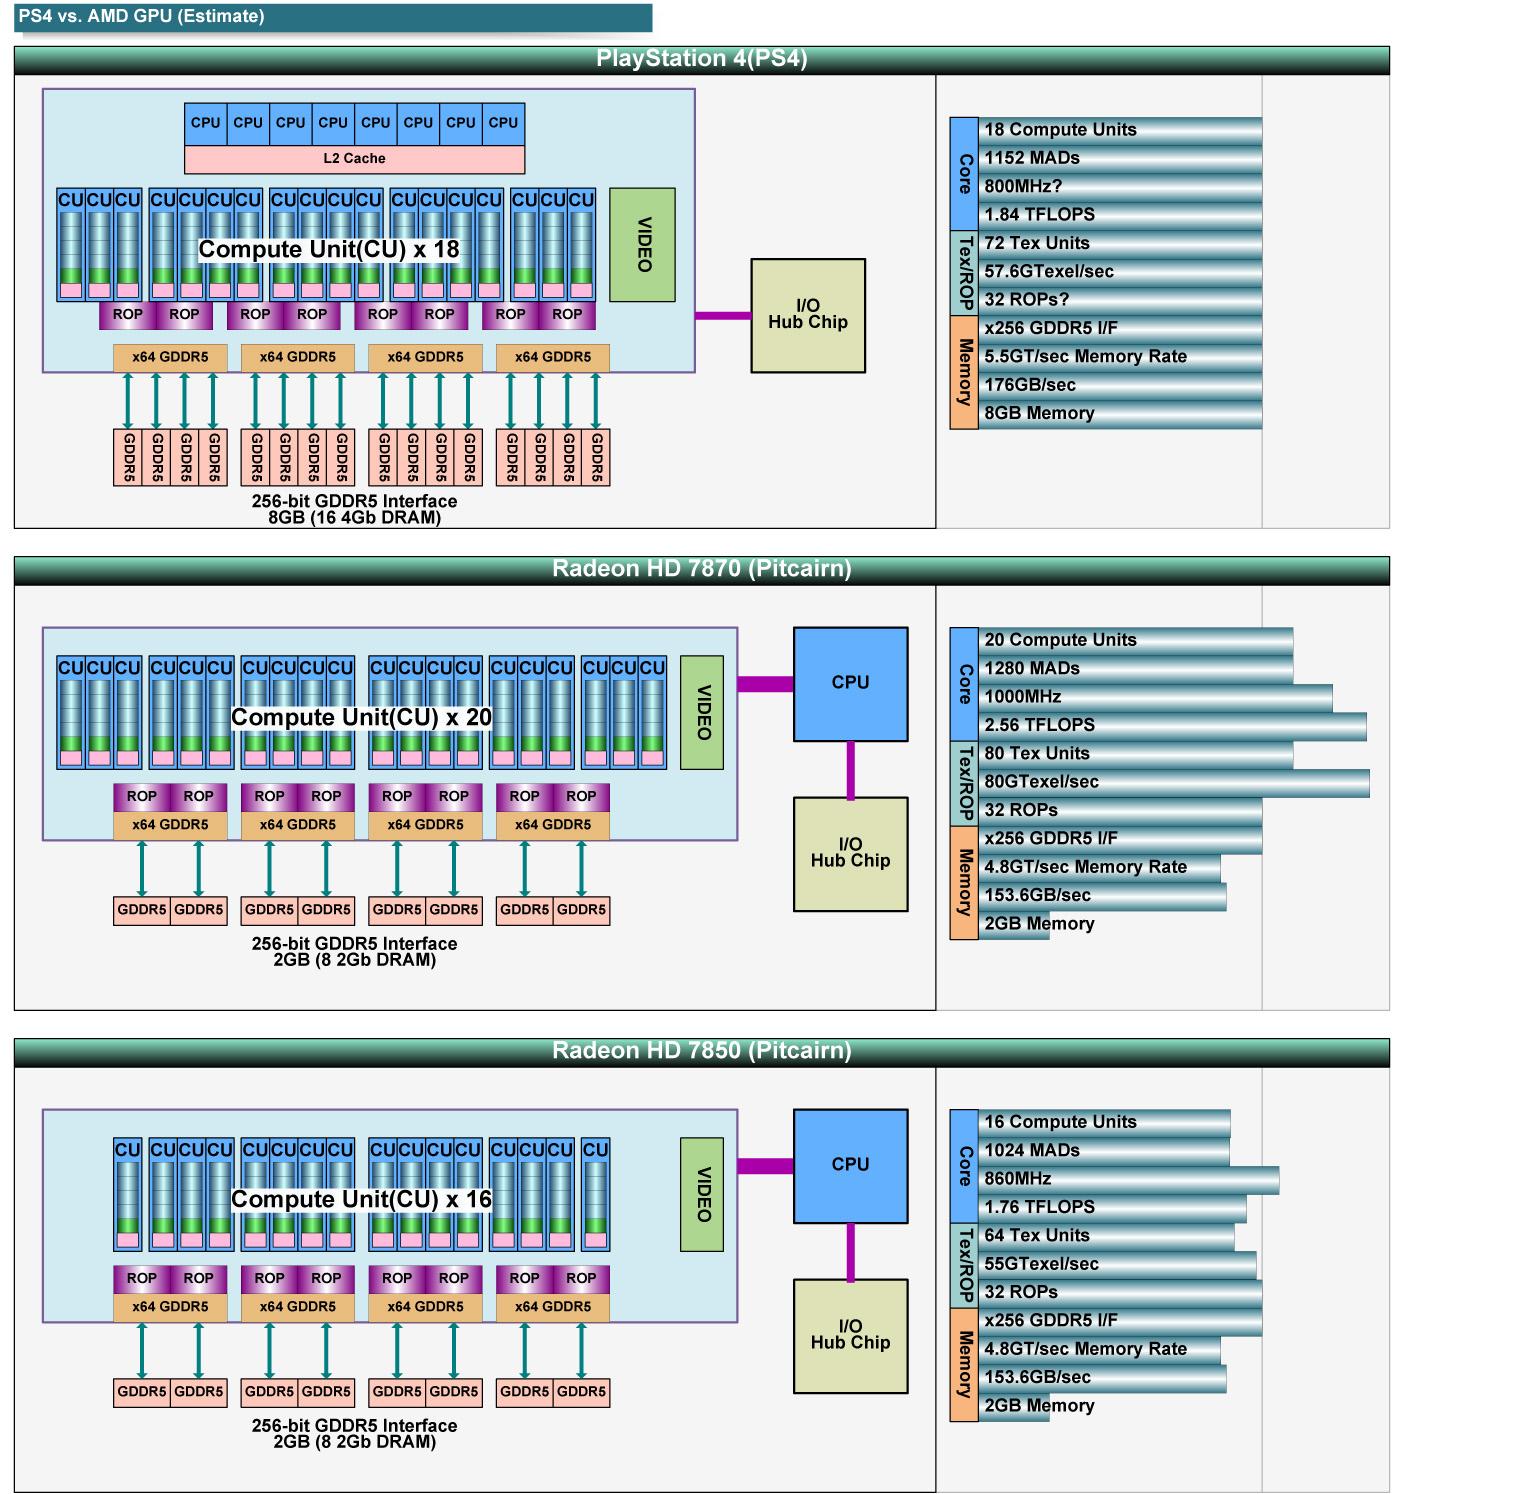 "AMD GPUとPS4のGPUの比較<br class="""">PDF版は<span class=""img-inline raw""><a href=""/video/pcw/docs/591/173/p10.pdf"" ipw_status=""1"" ipw_linktype=""filelink_raw"" class=""resource"">こちら</a></span>"